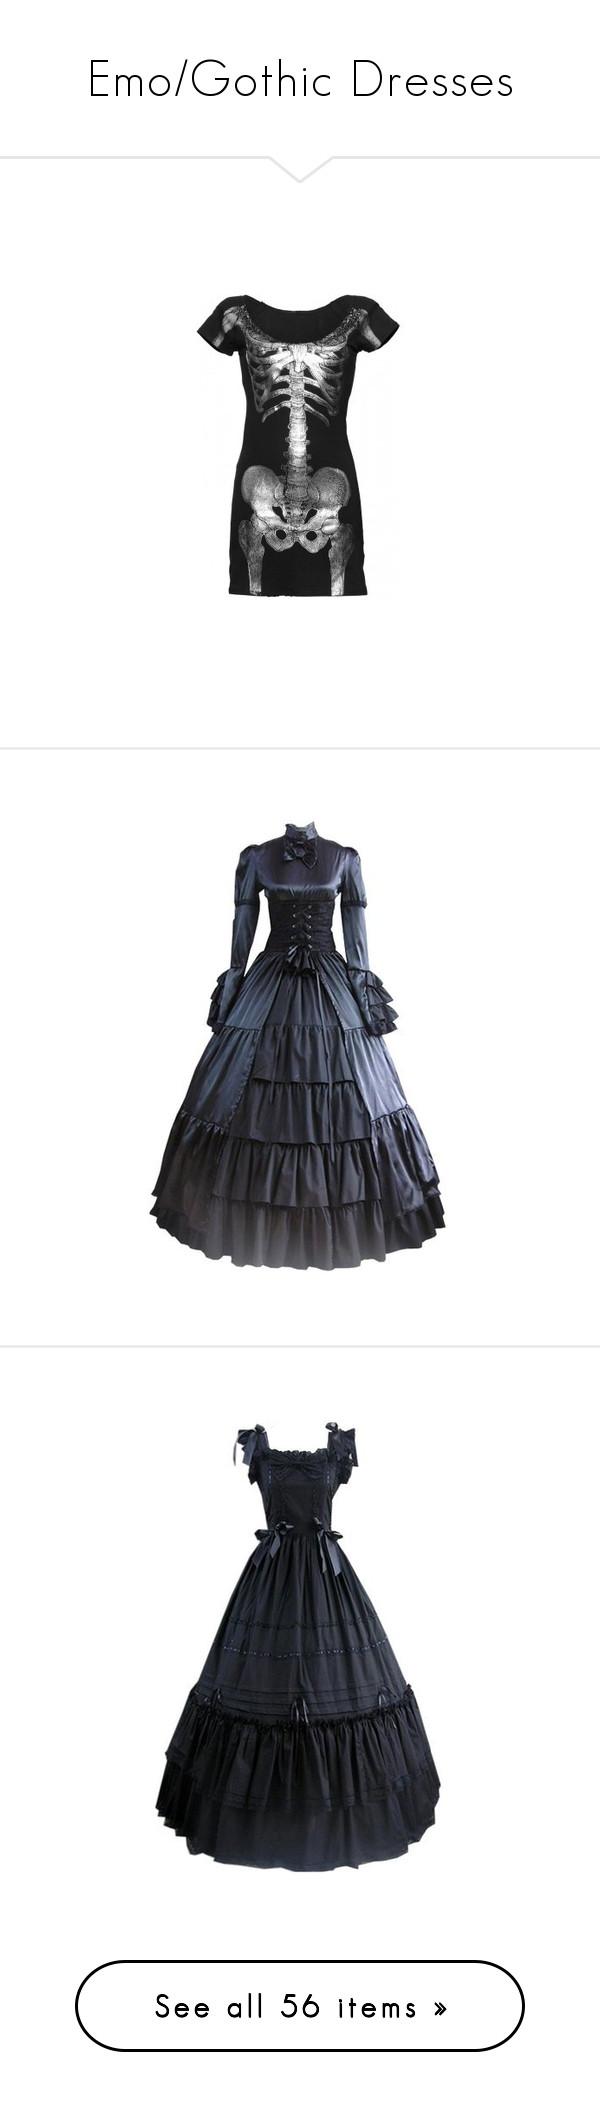 Emogothic dresses